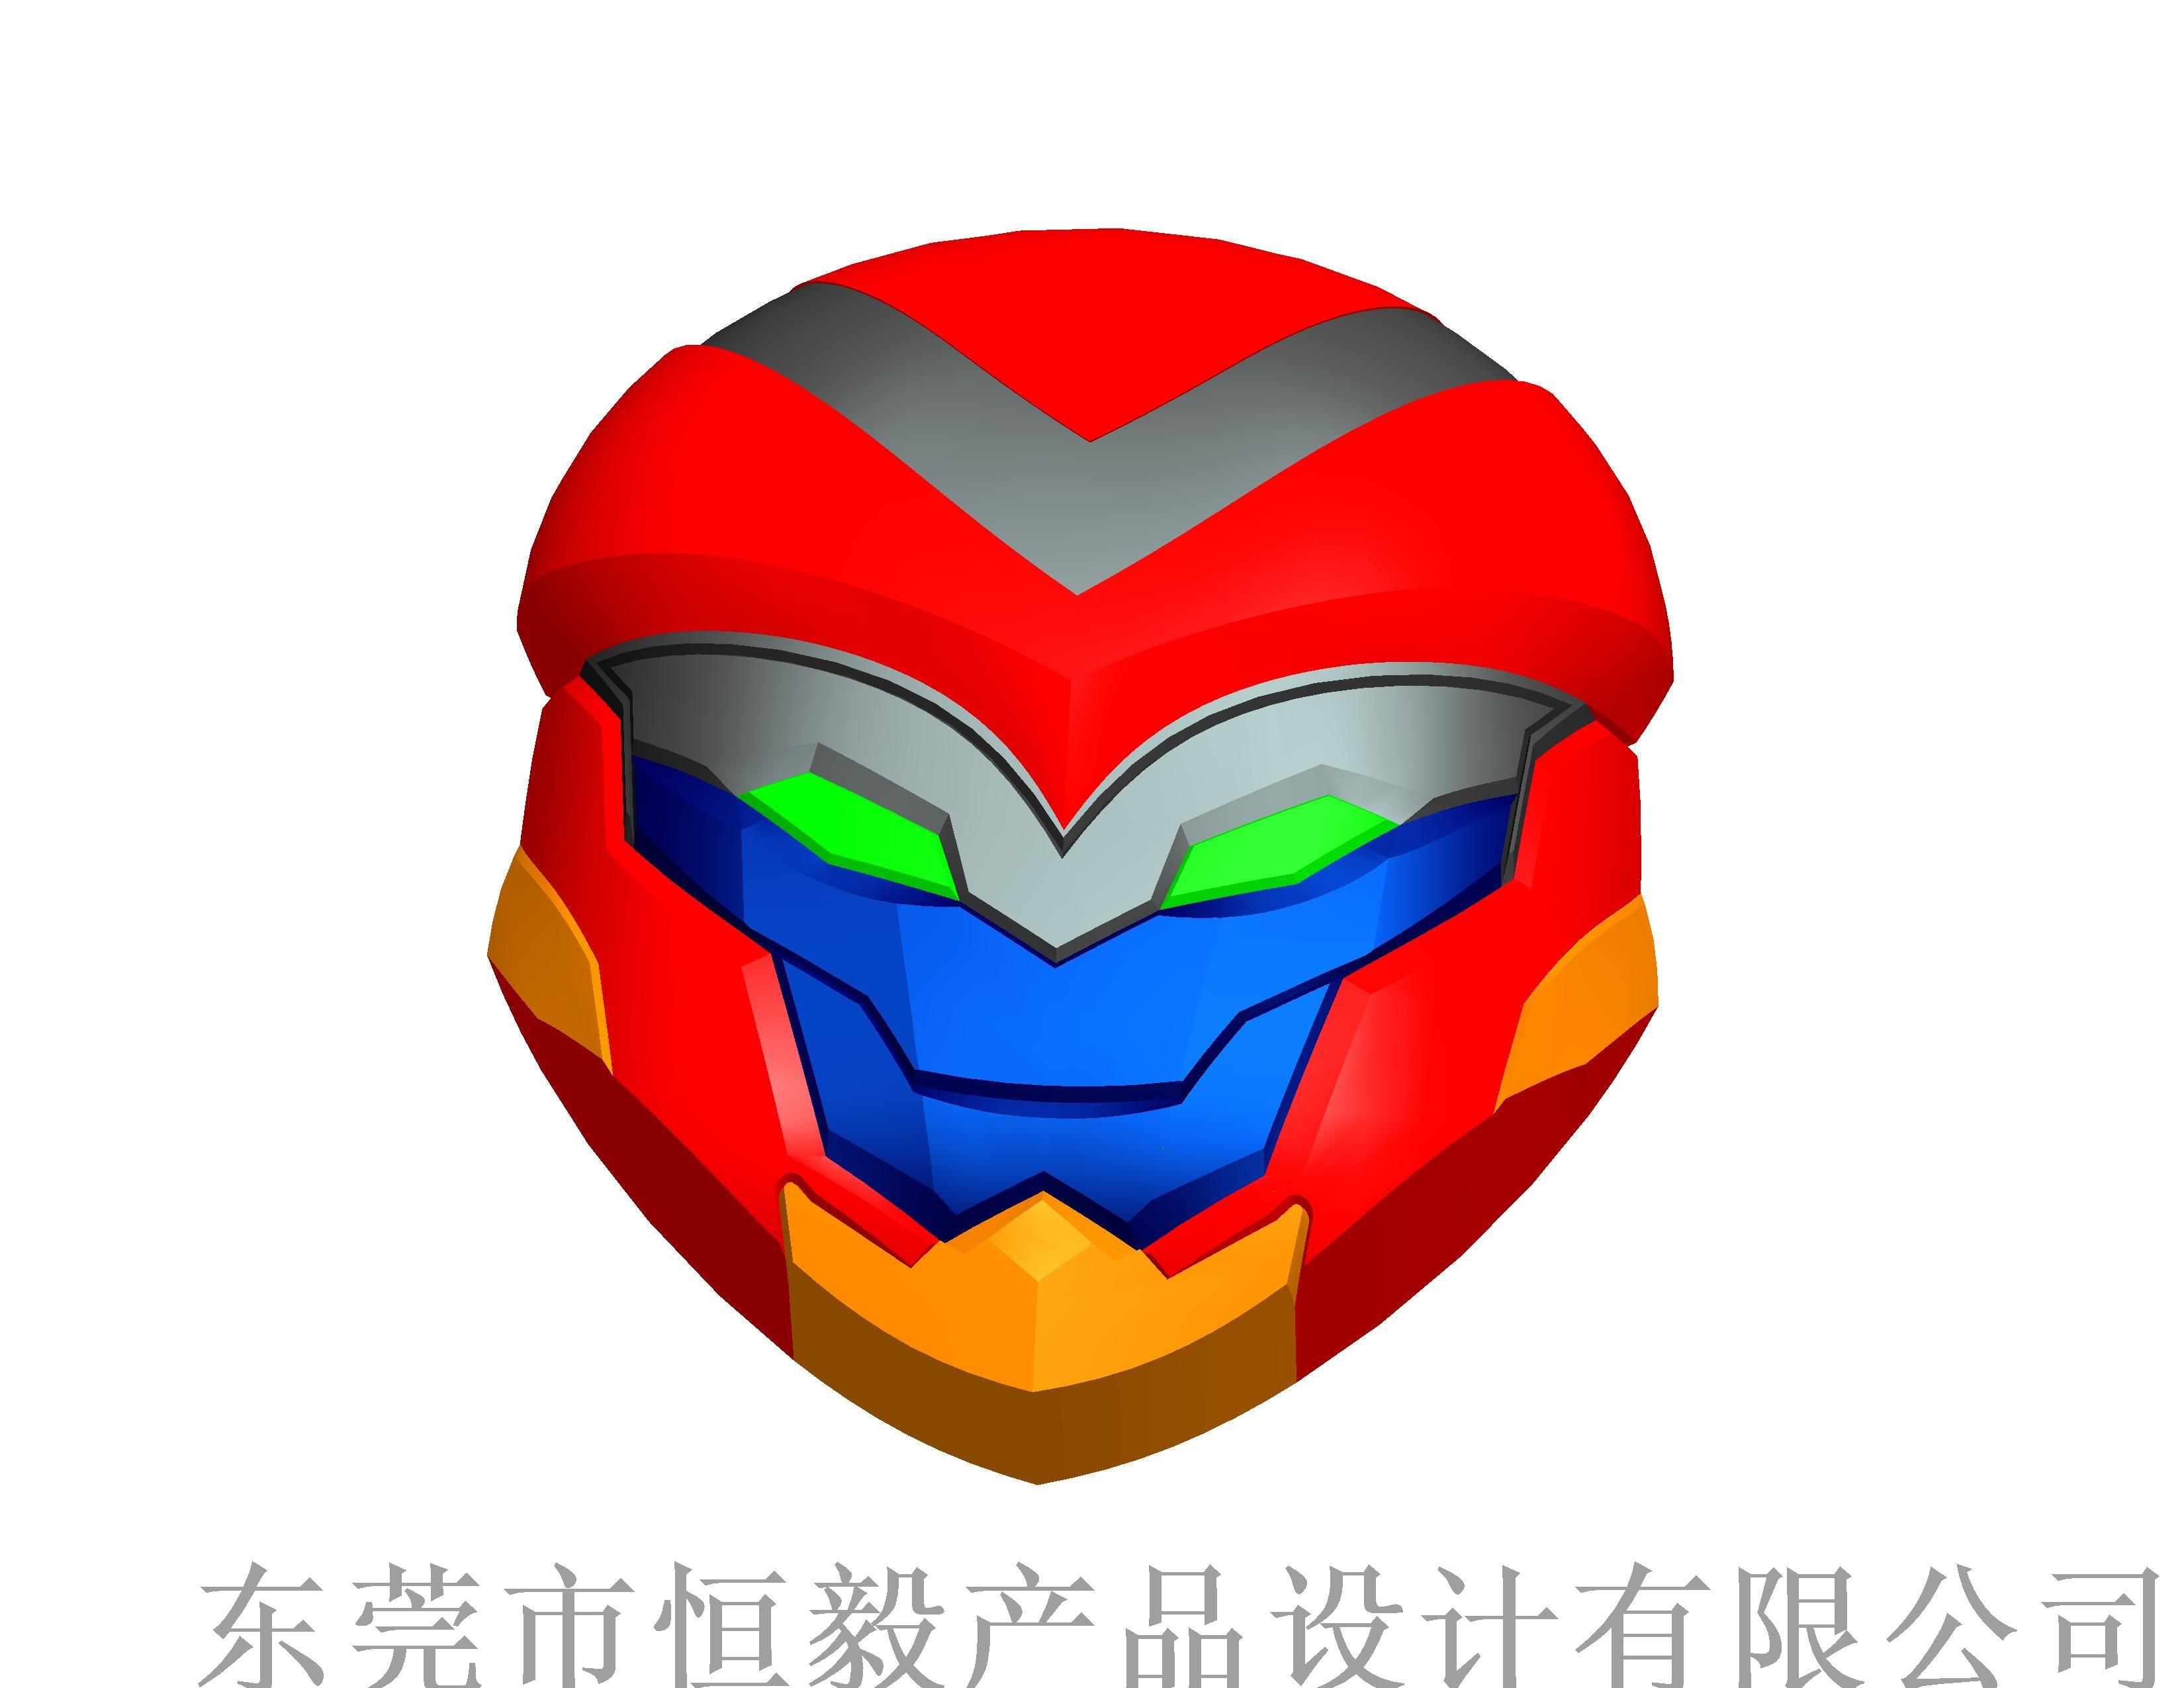 a012.jpg